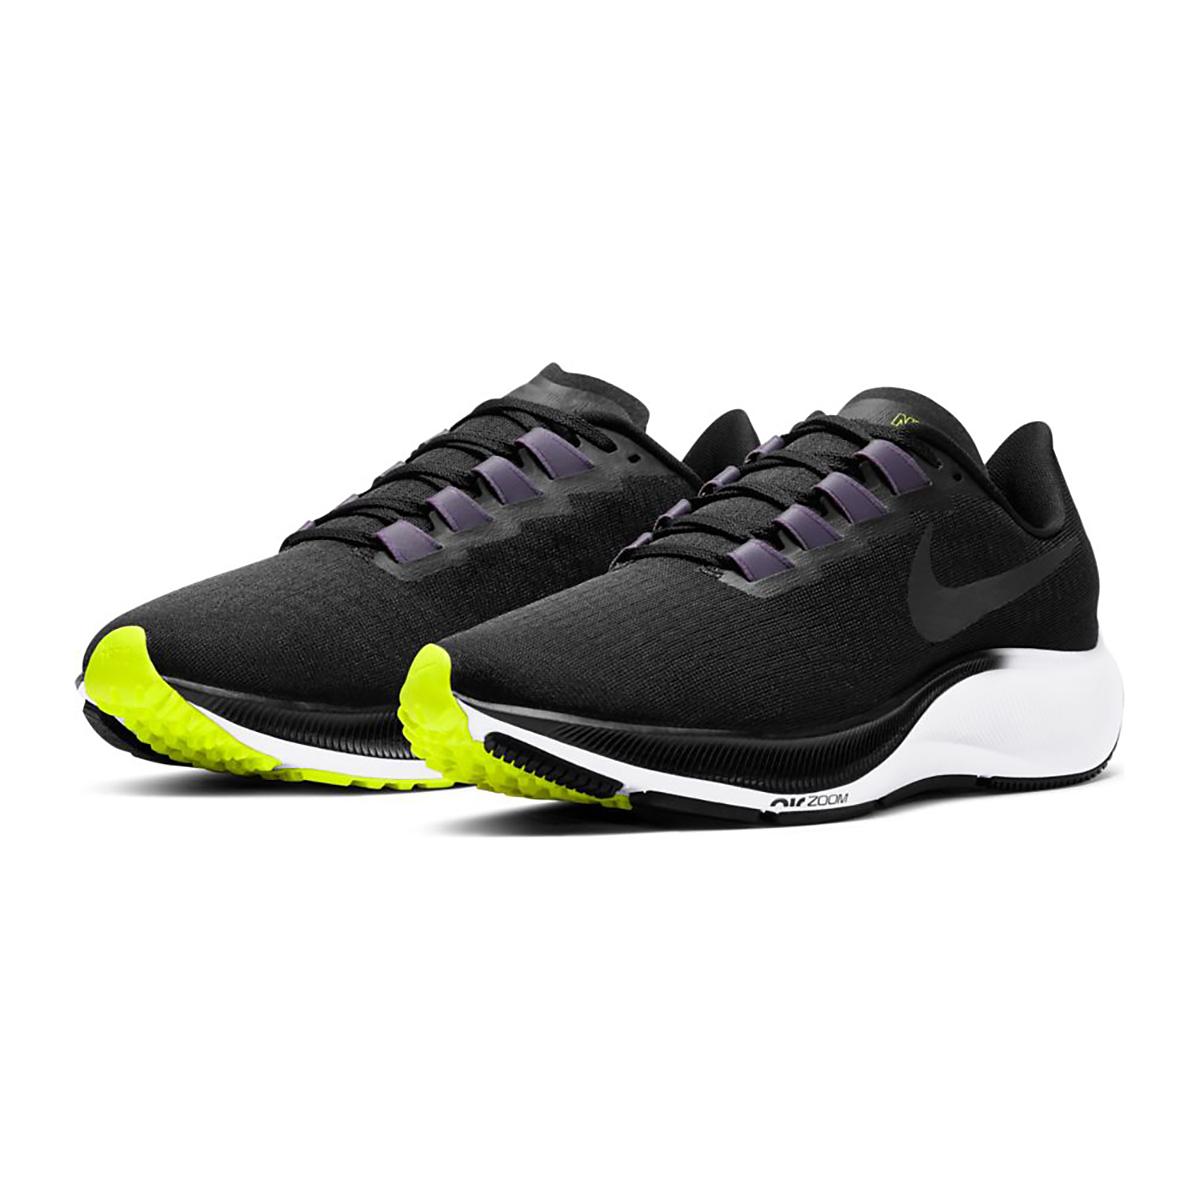 Women's Nike Air Zoom Pegasus 37 Running Shoe - Color: Black/Anthracite/Dark Raisin/White - Size: 5 - Width: Regular, Black/Anthracite/Dark Raisin/White, large, image 5